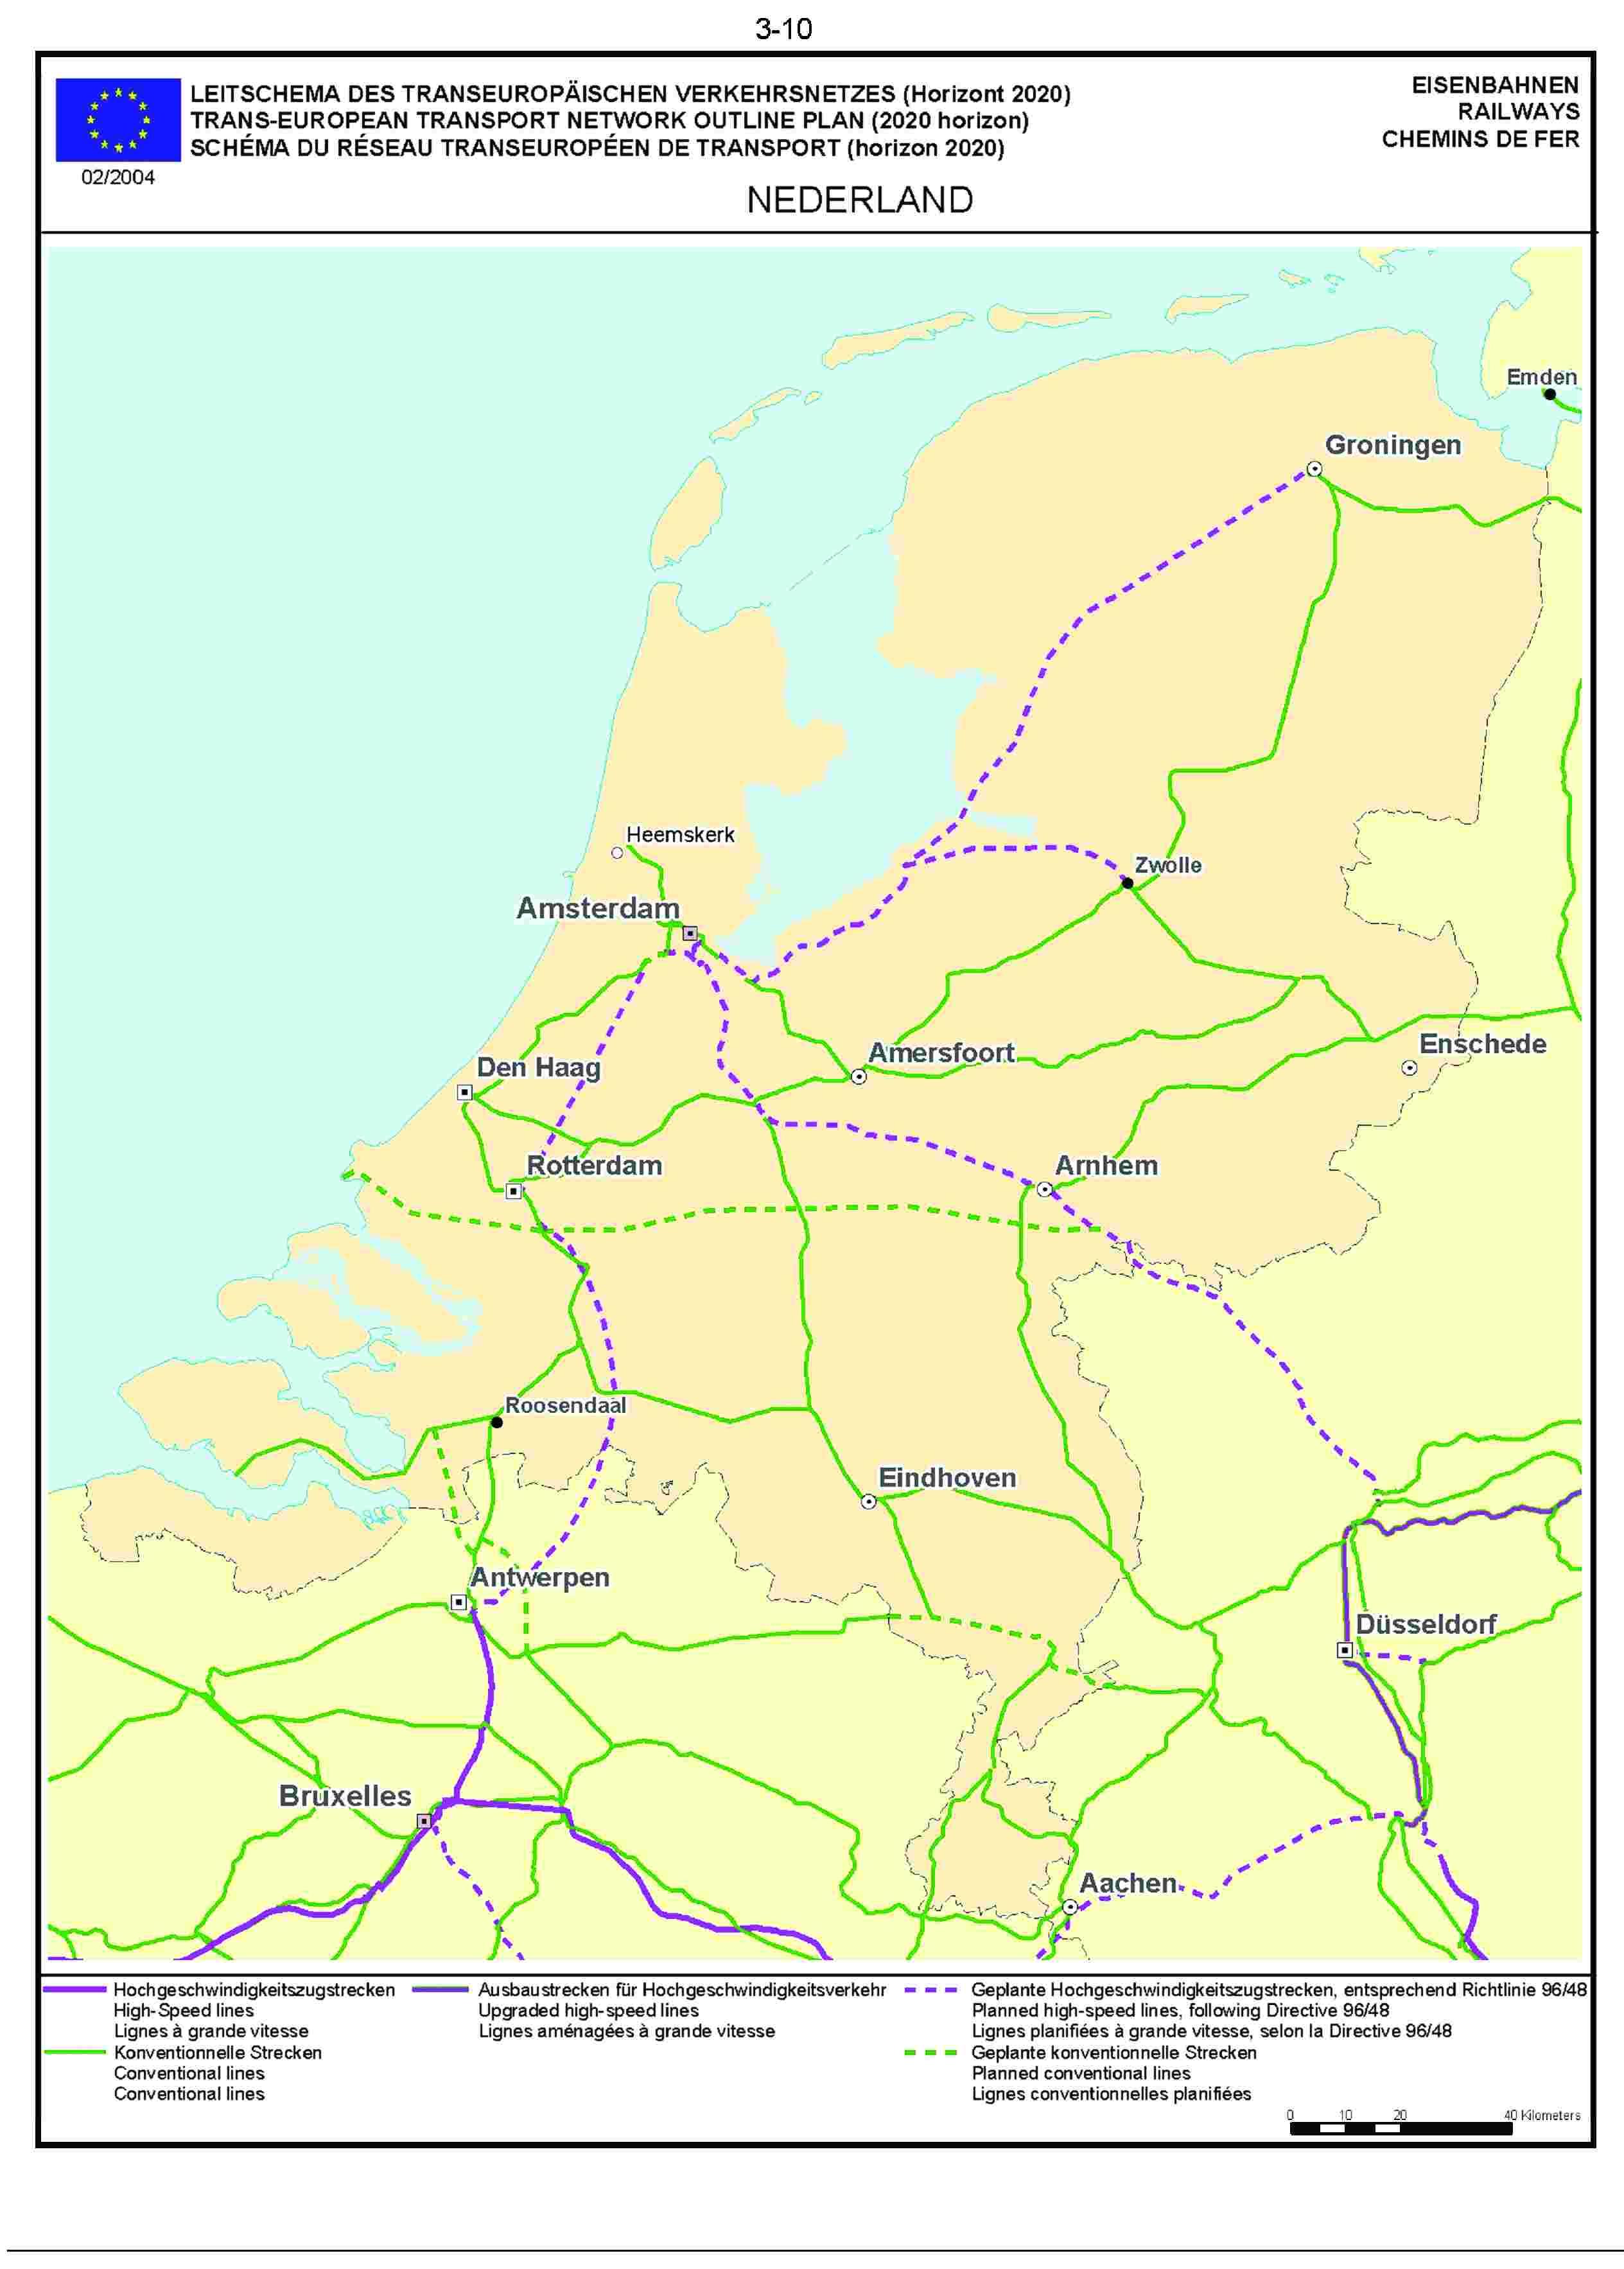 3.10LEITSCHEMA DES TRANSEUROPÄISCHEN VERKEHRSNETZES (Horizont 2020) EISENBAHNENTRANS-EUROPEAN TRANSPORT NETWORK OUTLINE PLAN (2020 horizon) RAILWAYSSCHÉMA DU RÉSEAU TRANSEUROPÉEN DE TRANSPORT (horizon 2020) CHEMINS DE FER02/2004NEDERLAND